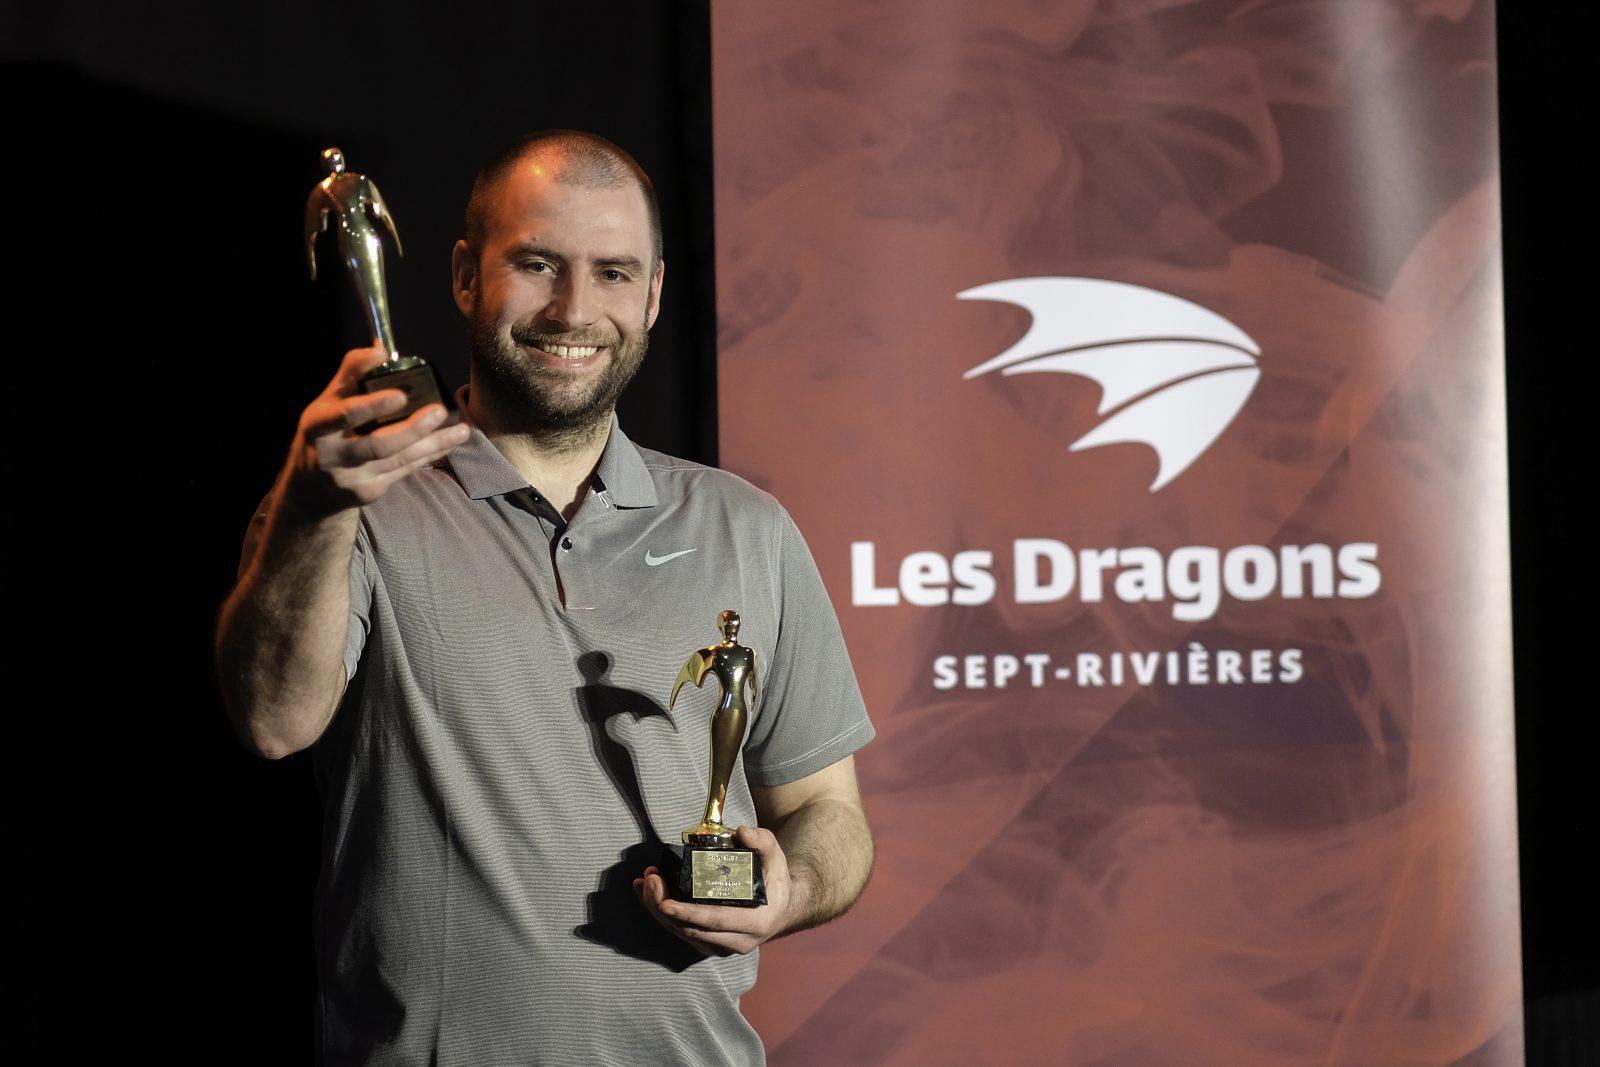 Micaël Landry cultive les Dragons avec ses Terres Boréales